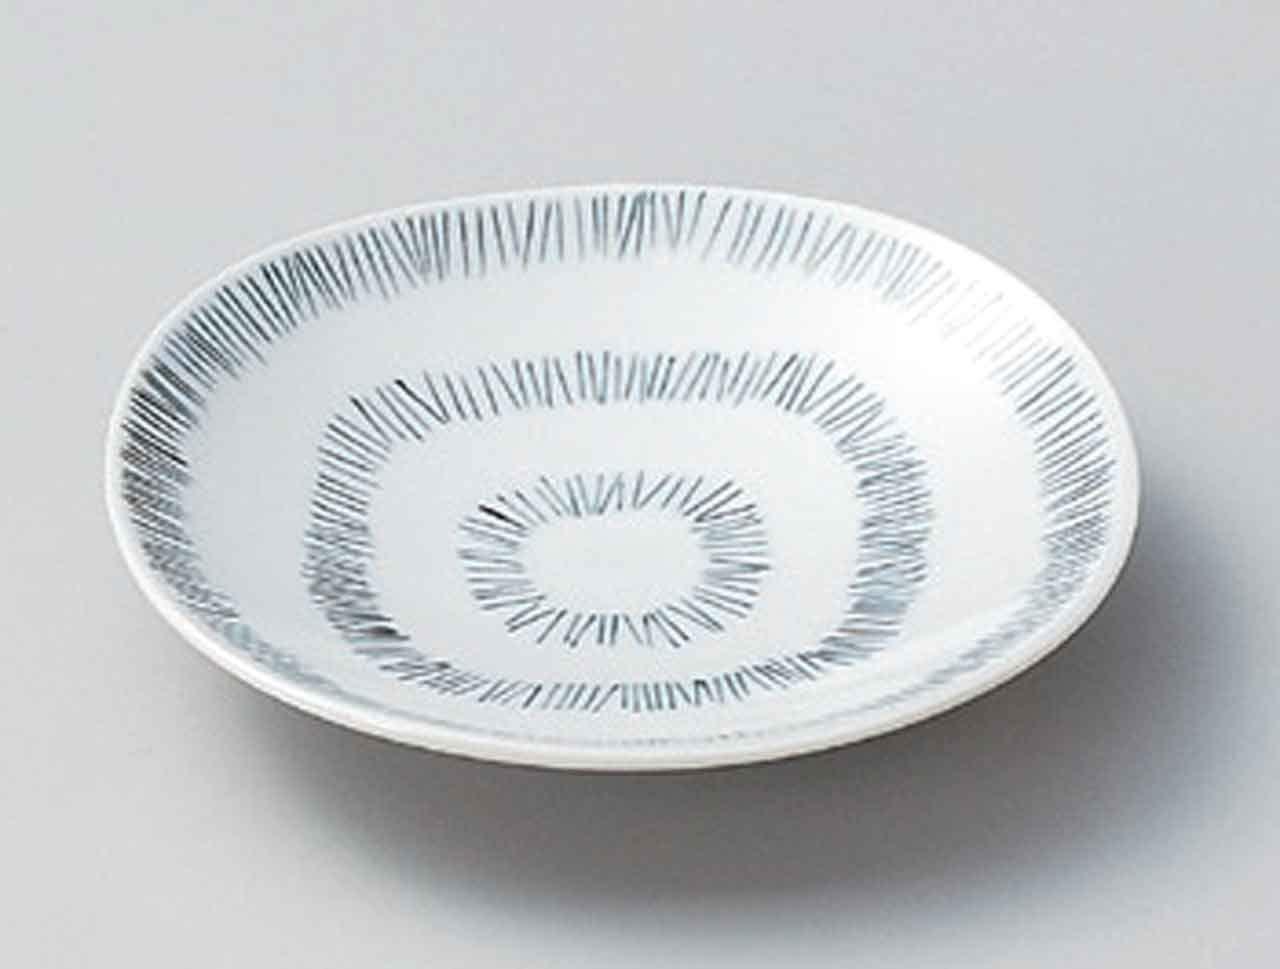 Tanpopo 5.1inch Set of 2 Medium Plates porcelain Made in Japan